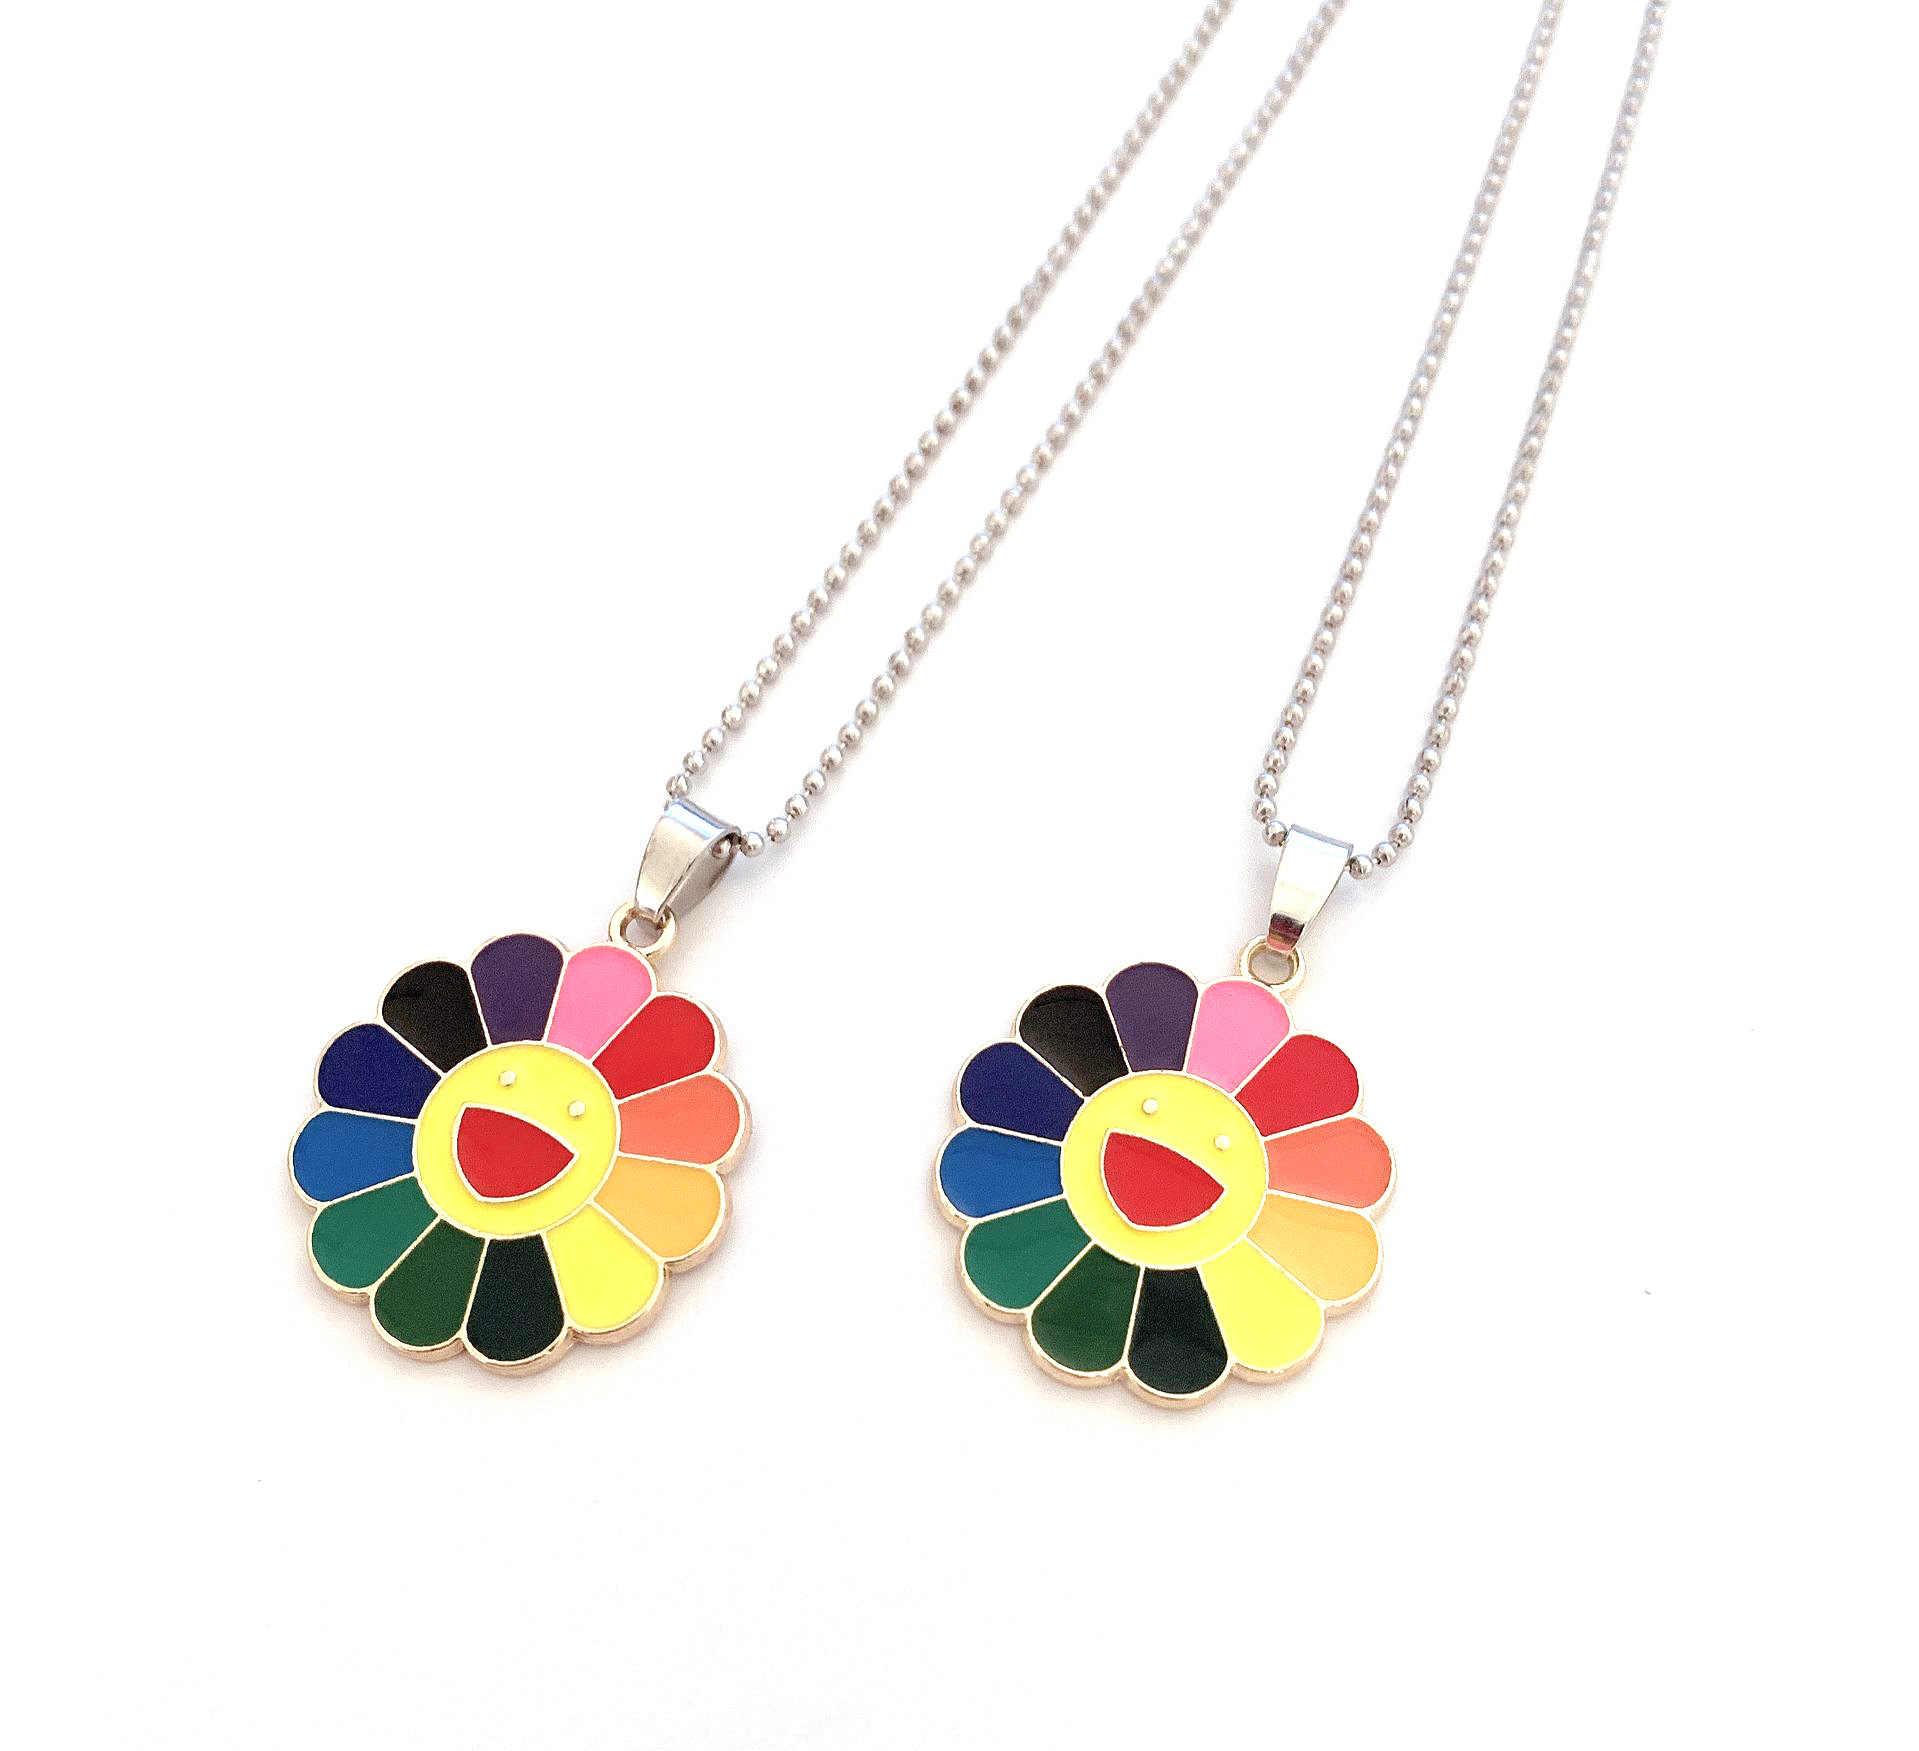 1Pcs Mode Legierung Klassische Anhänger Halskette Murakami Sonne Blume Sonnenblume Bunte Blütenblätter Smiley Können Gedreht Werden Dropshipping